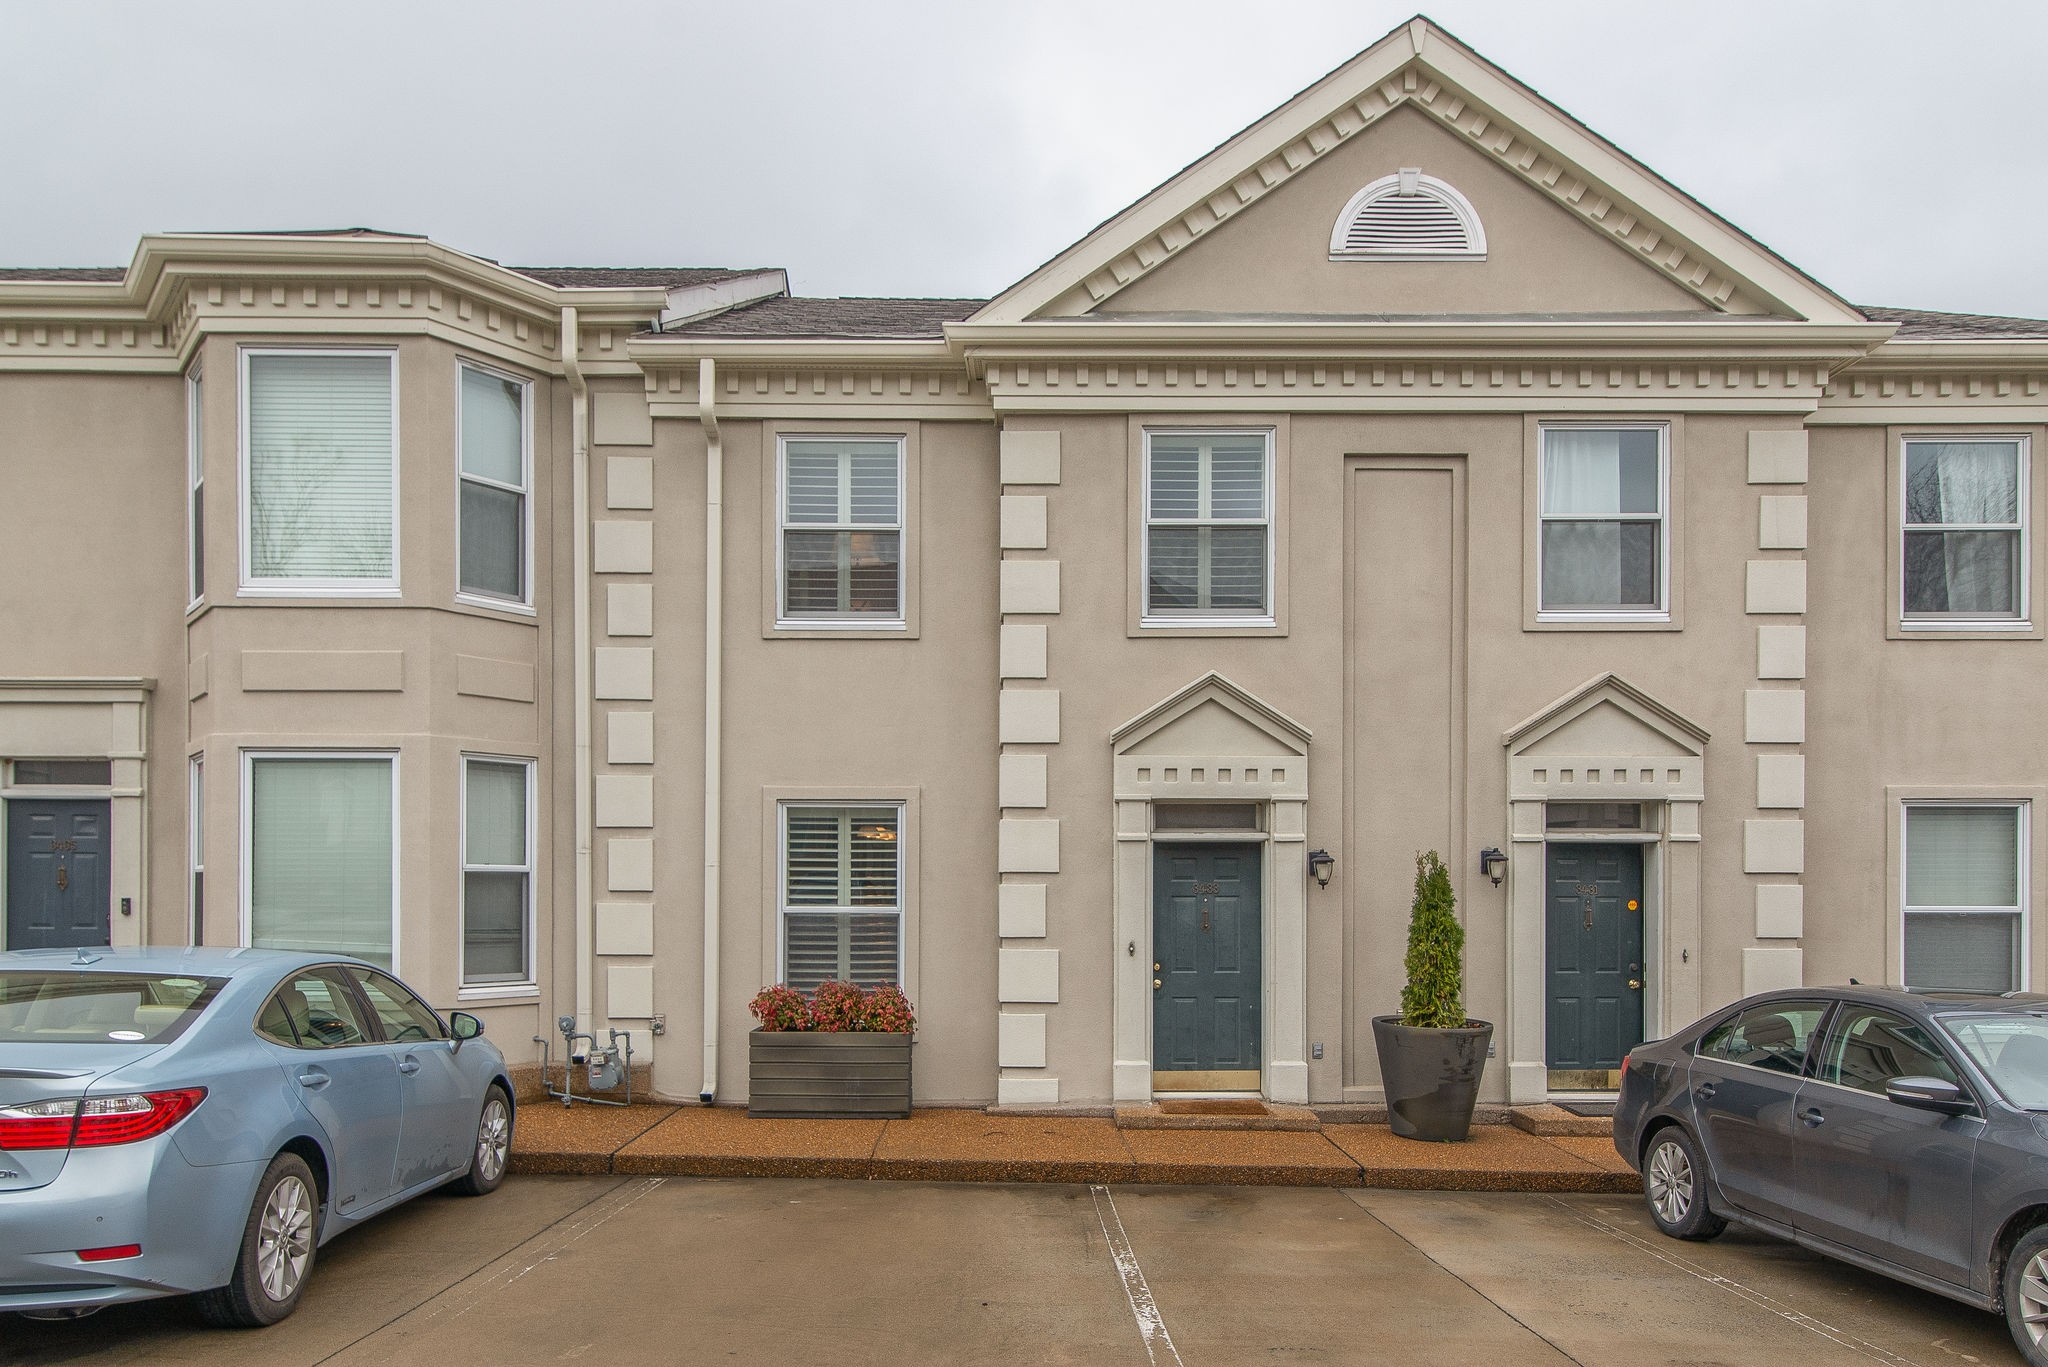 3433 Golf Club Ln, Nashville, TN 37215 - Nashville, TN real estate listing